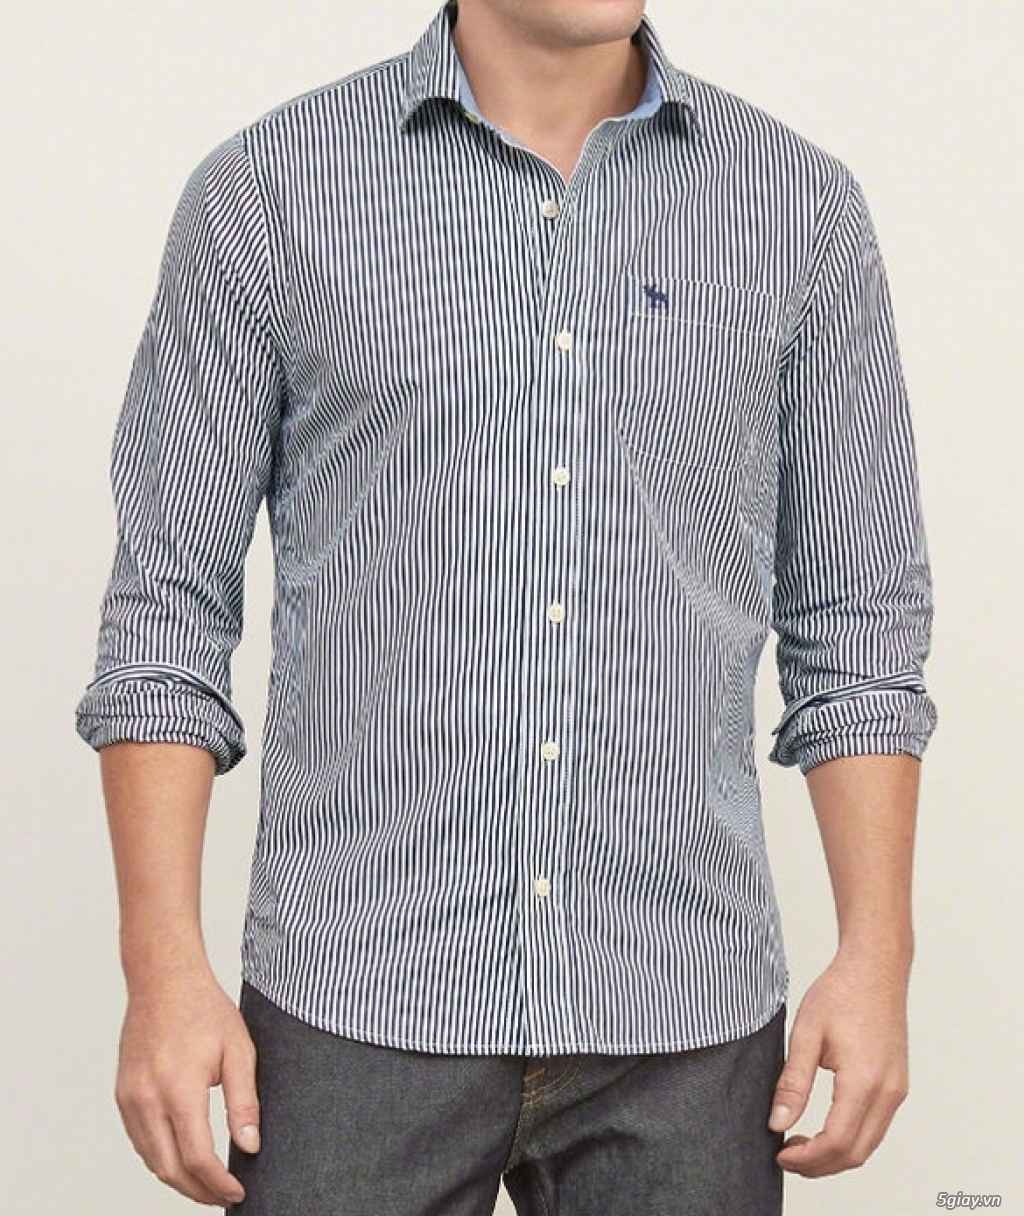 [ Lamanshop.com ]- Quần áo HOLLISTER - ABERCROMBIE & FITCH - Chính hãng USA 100% - 18